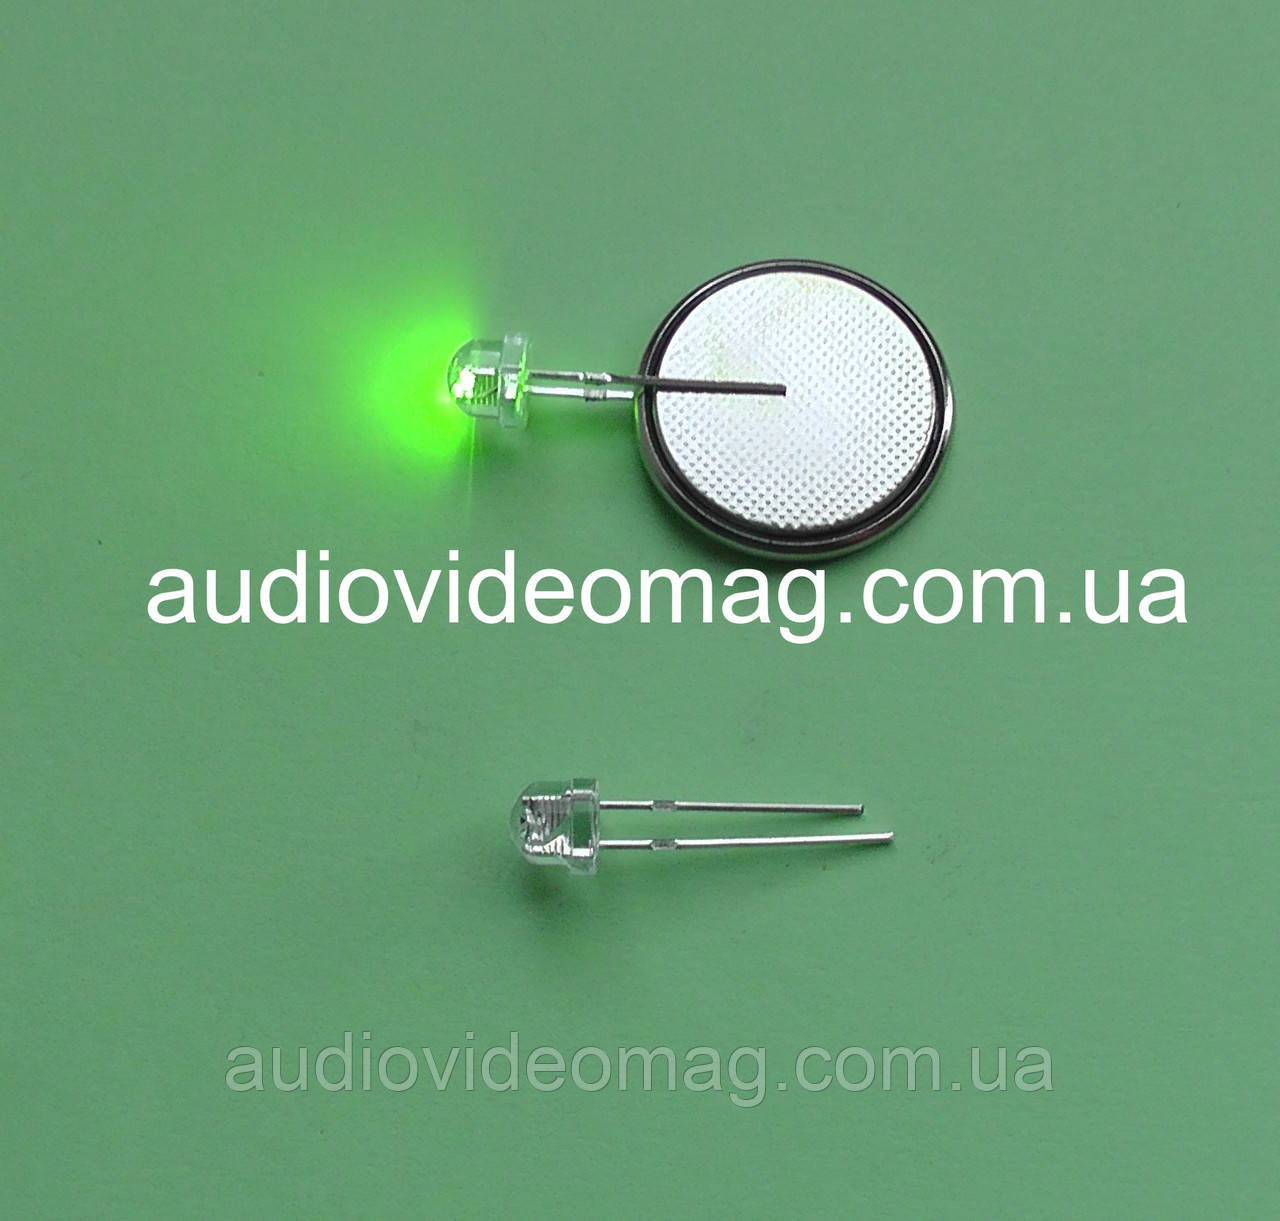 Светодиод 3V 4,8 мм, цвет - зелёный